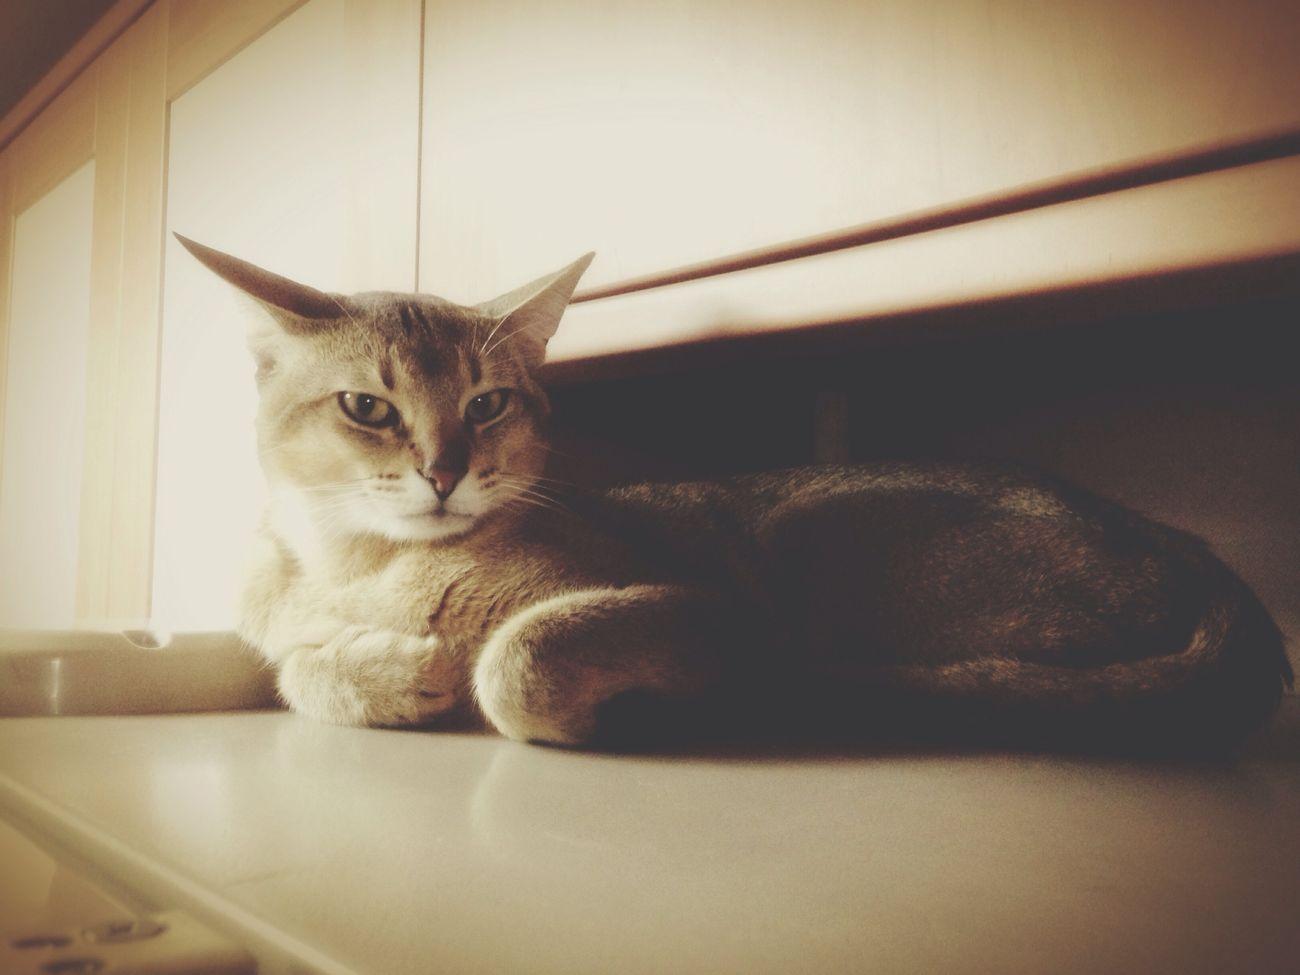 Cat♡ Cat Animals 도도한 그냥. 수컷주제에 이뻐!!